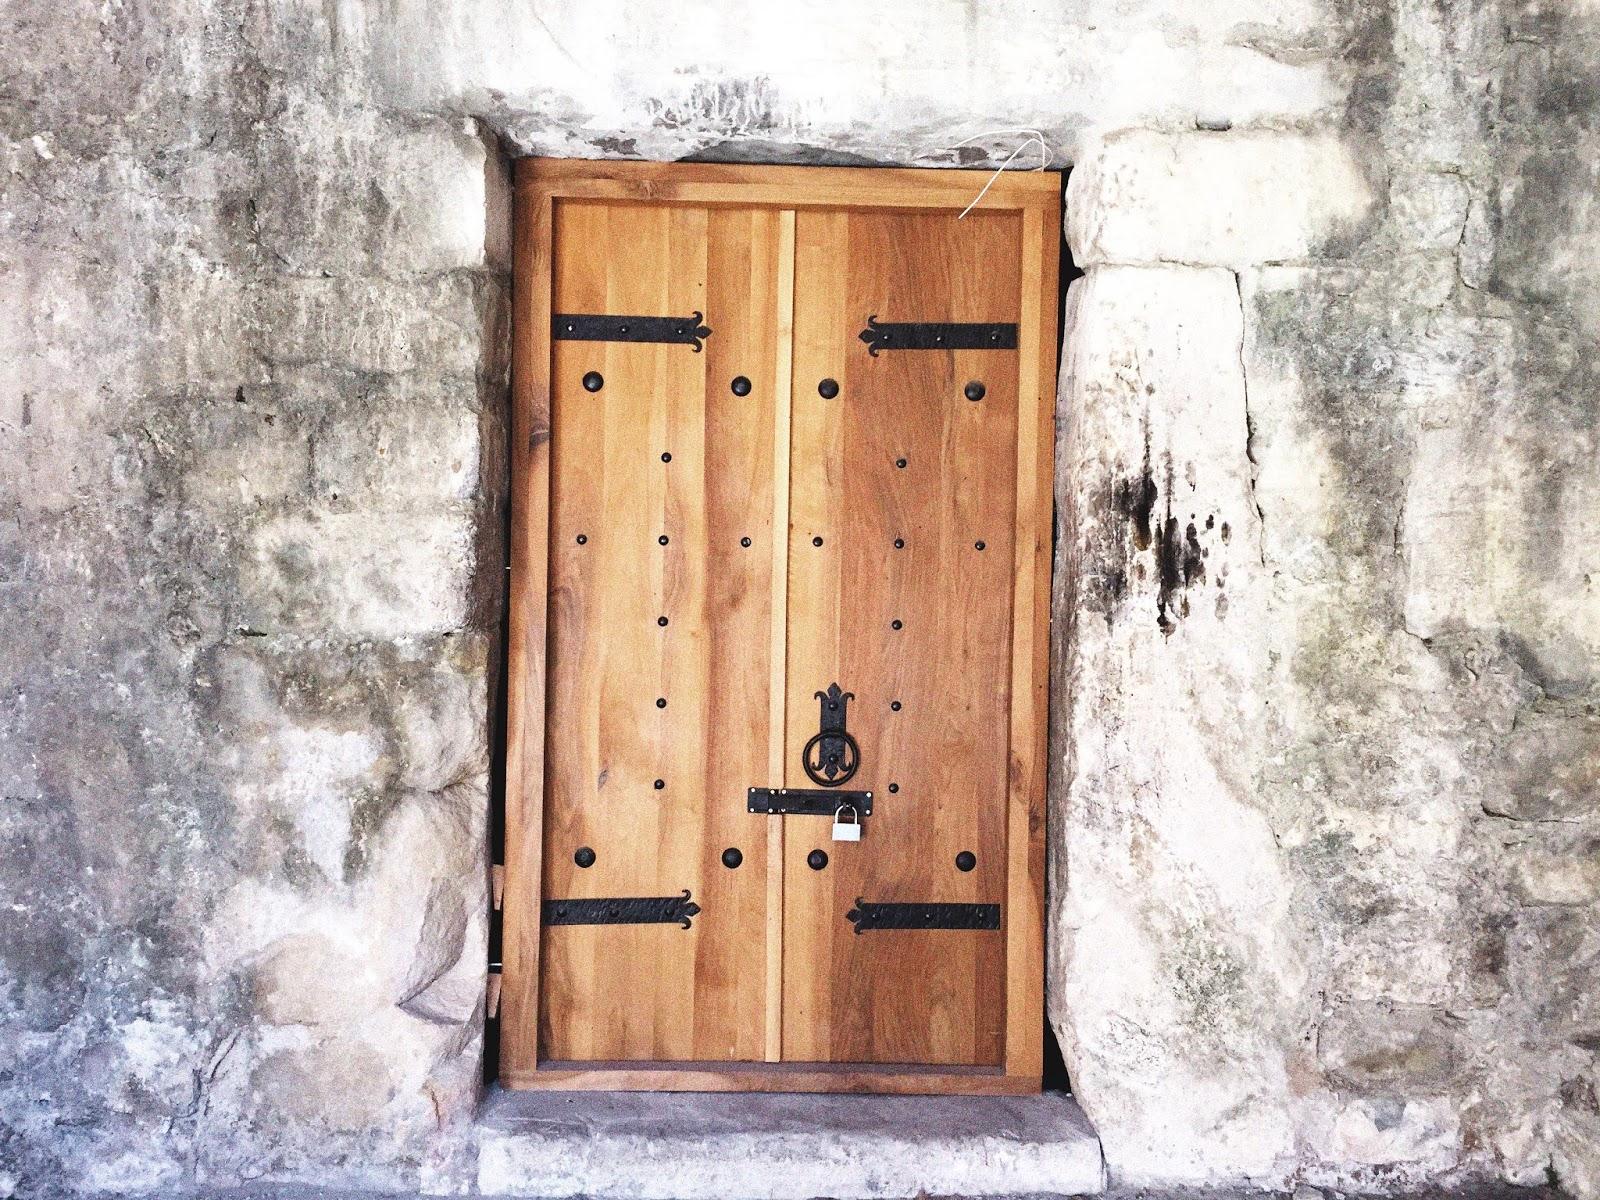 Ananuri Fortress doors